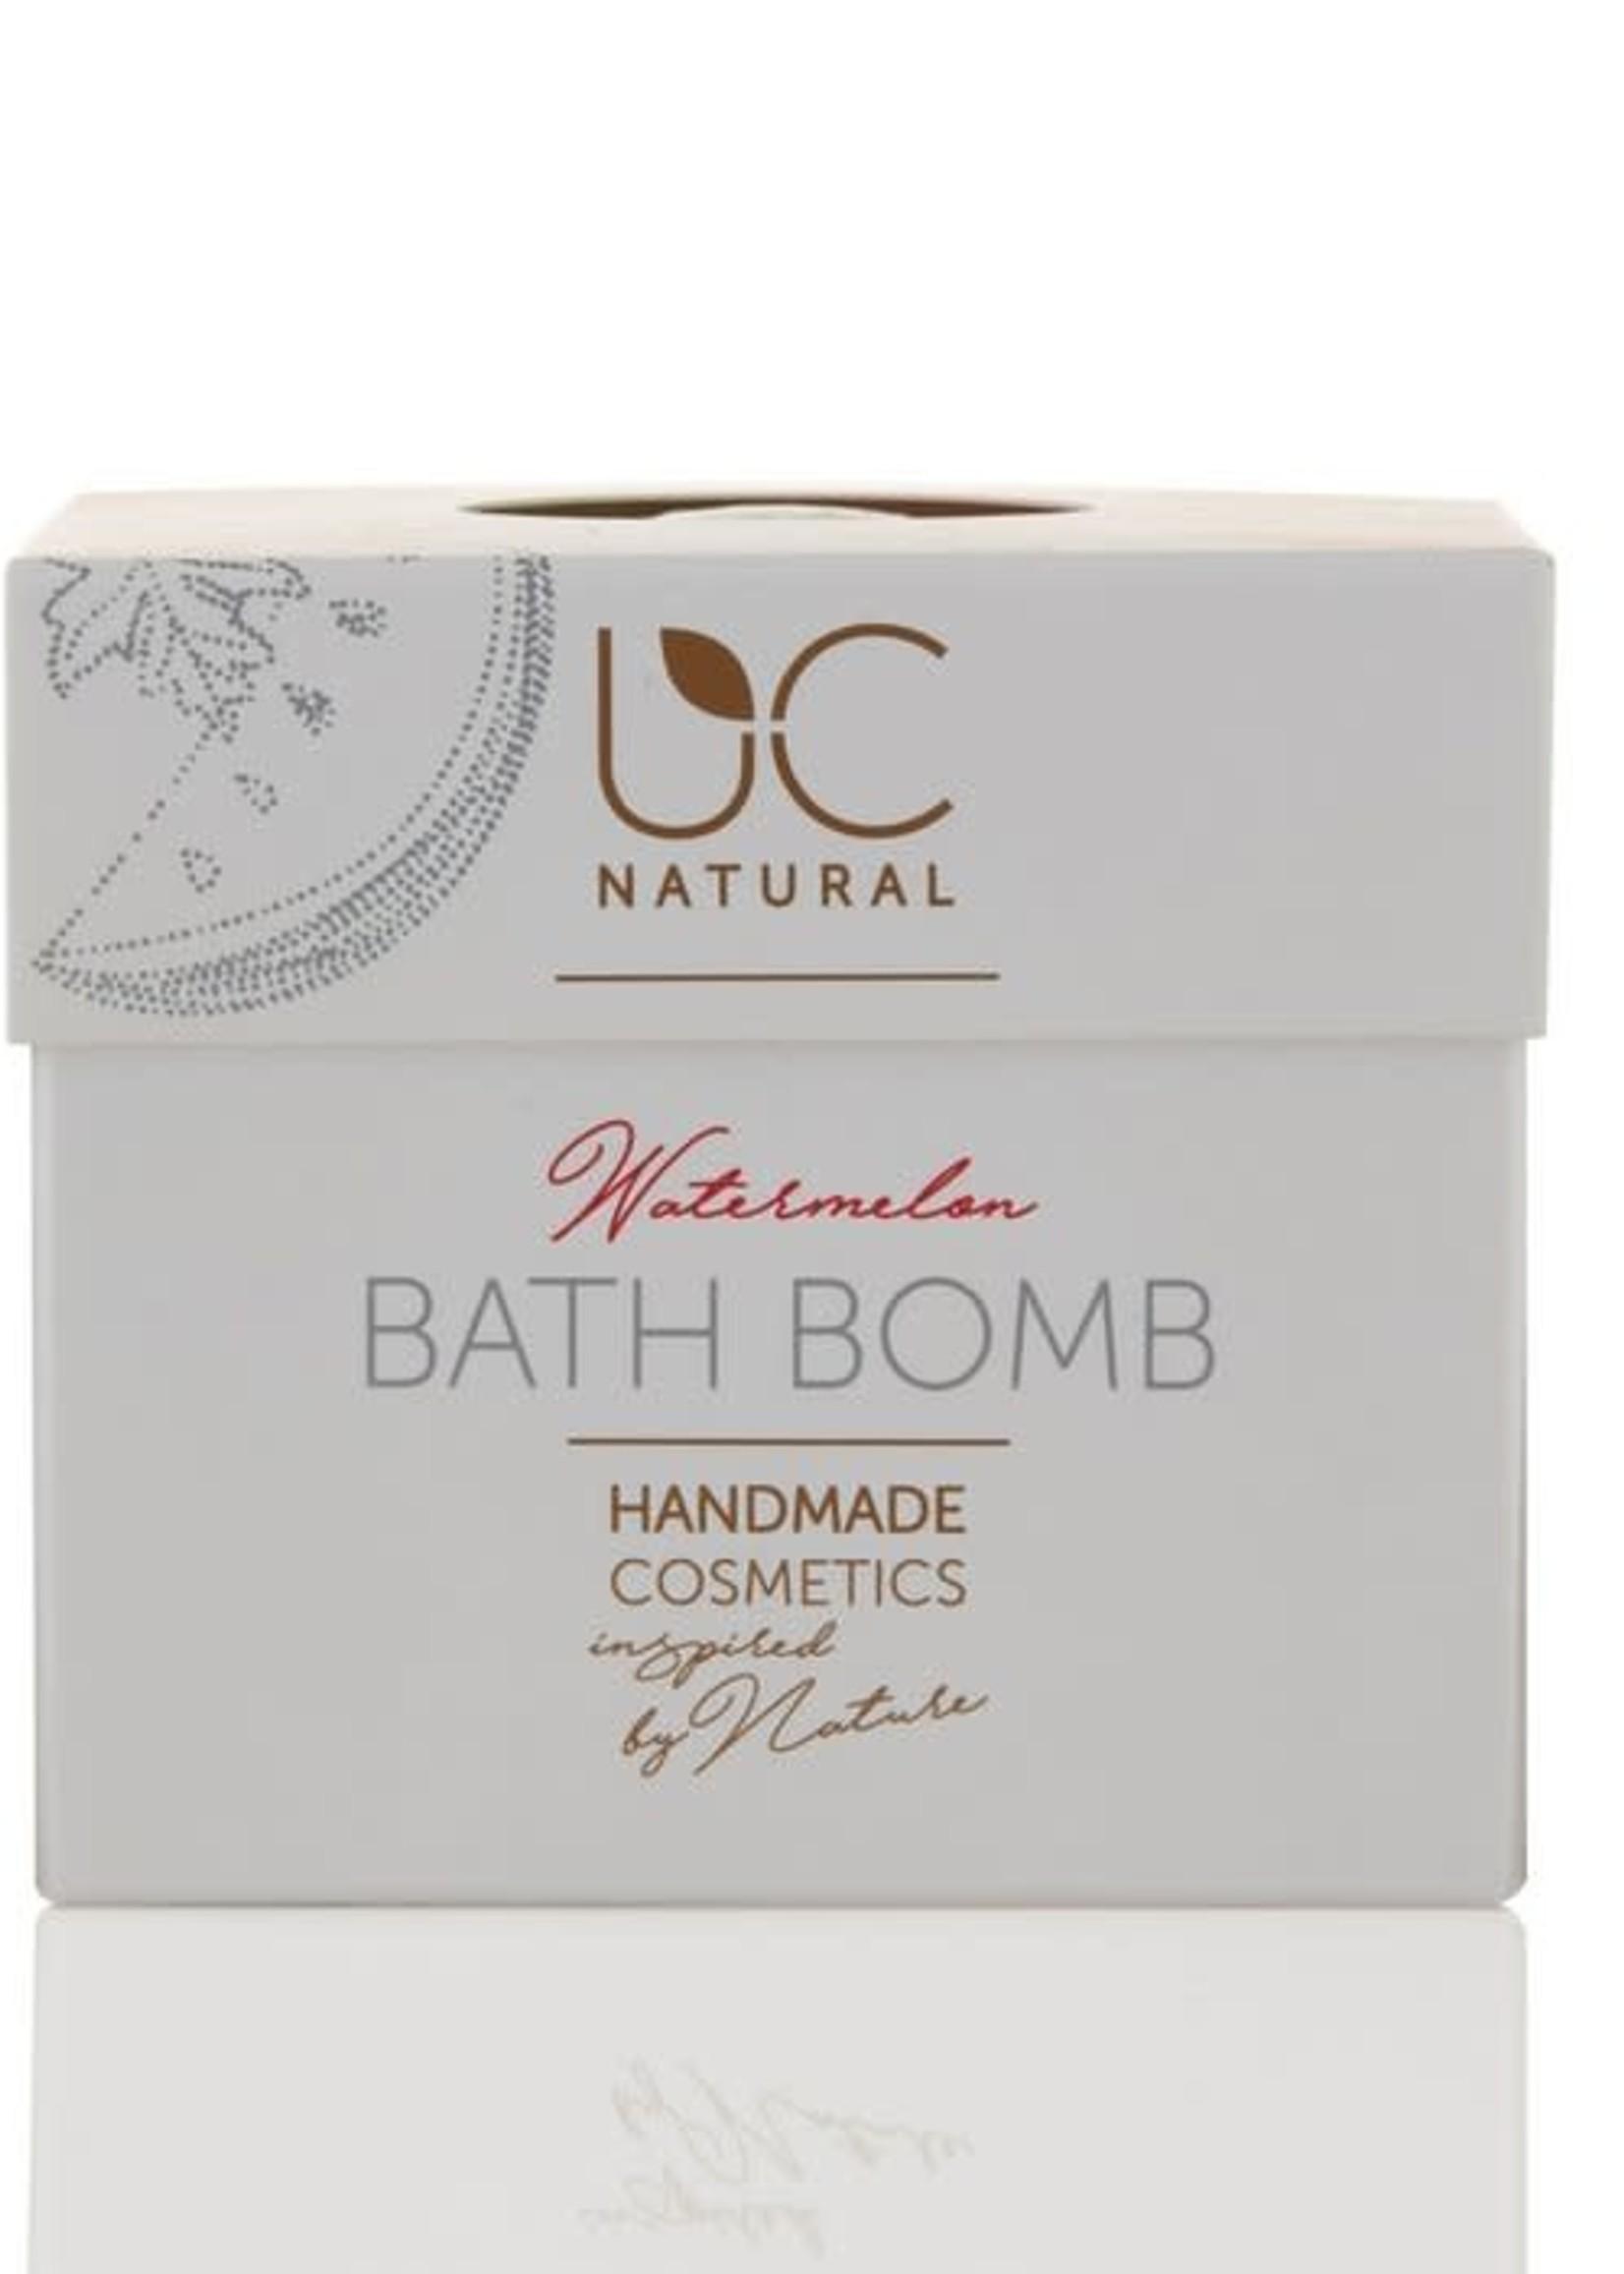 UC Naturel UC Natural - Bath Bomb - Watermeloen Badbruisbal